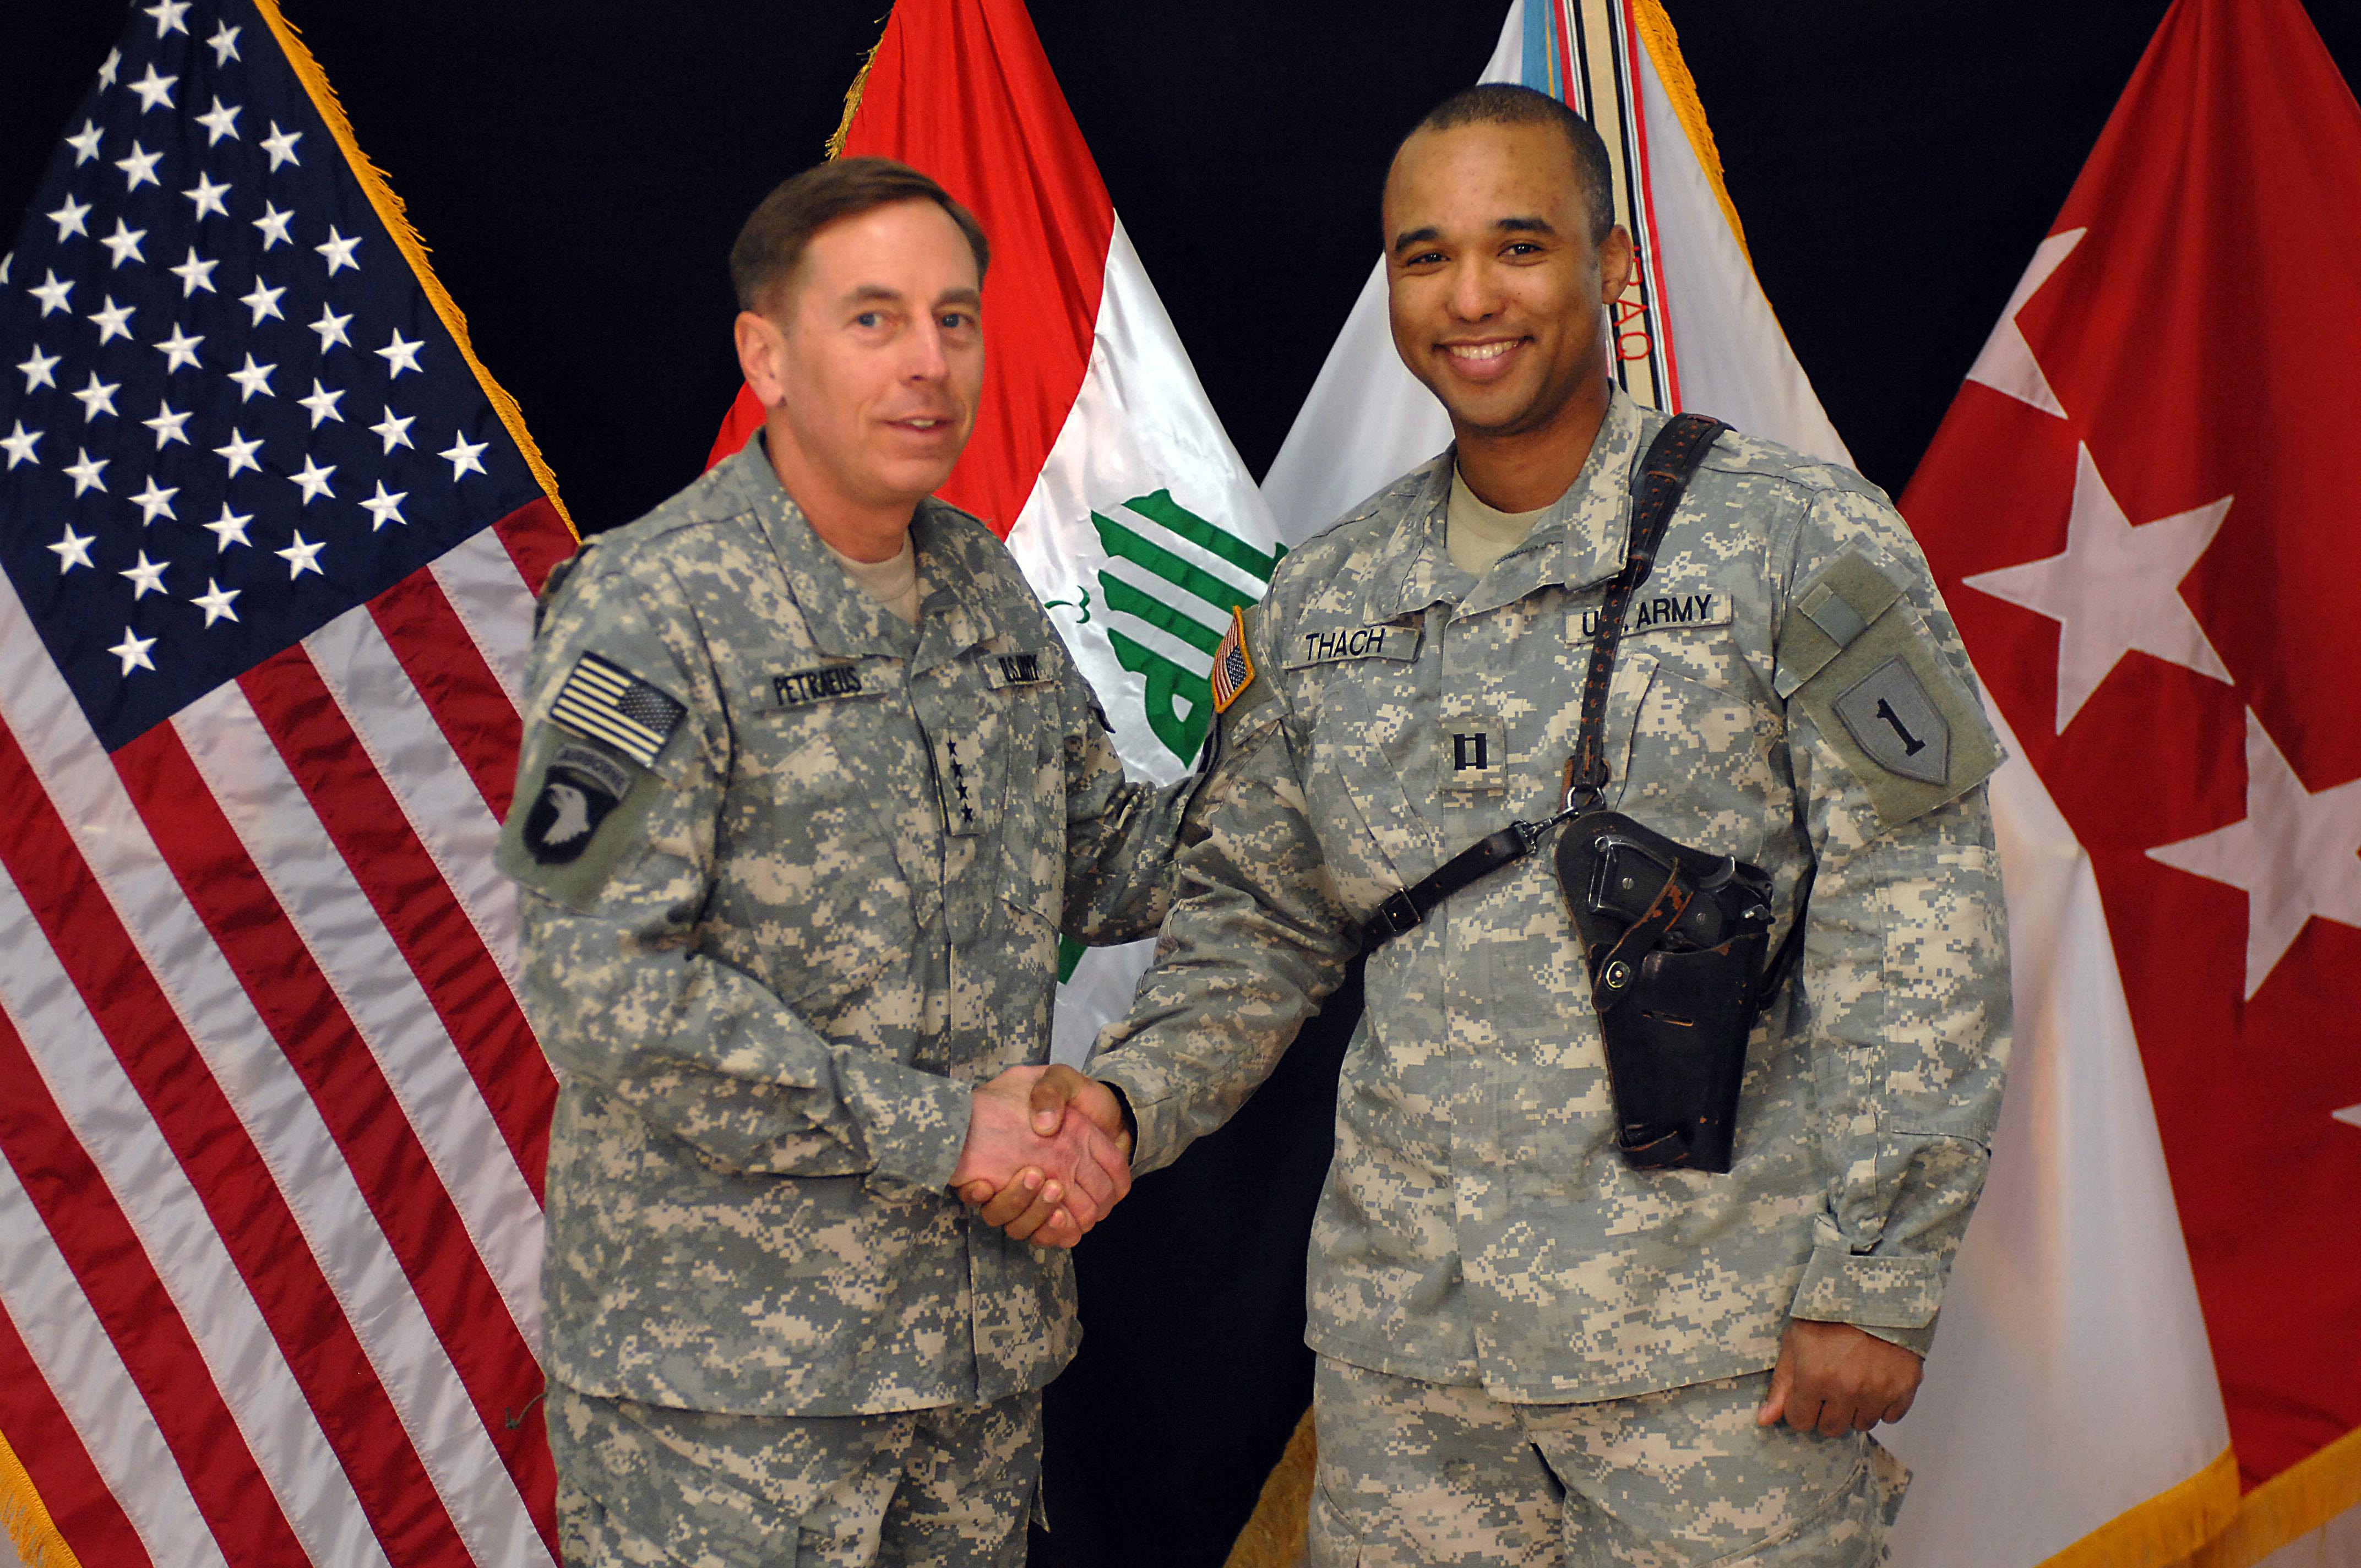 Vietnamese American Army Captain Awarded Bronze Star In Iraq